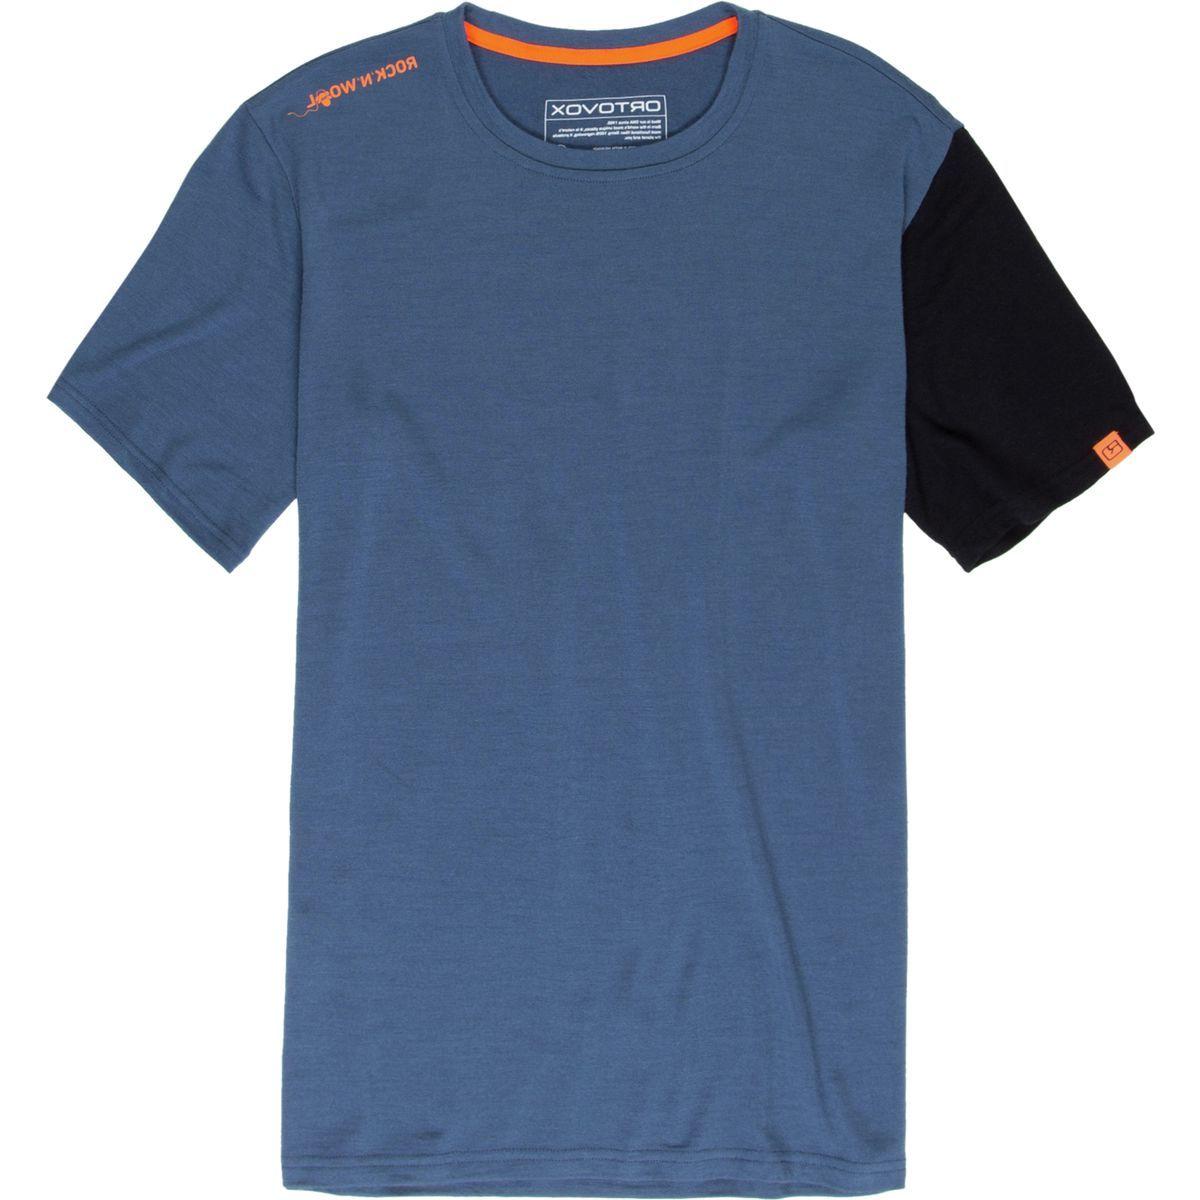 Ortovox Merino Rock'N'Wool Shirt - Men's